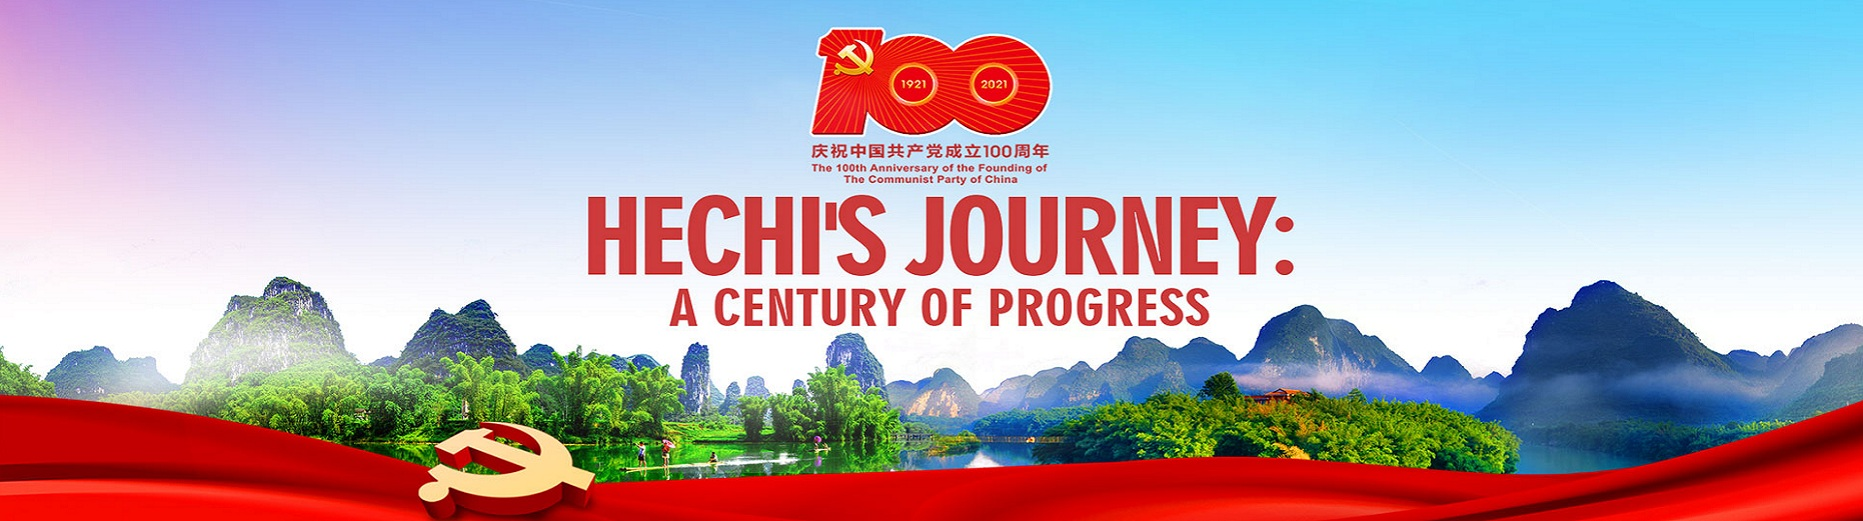 Hechi's journey: A century of progress